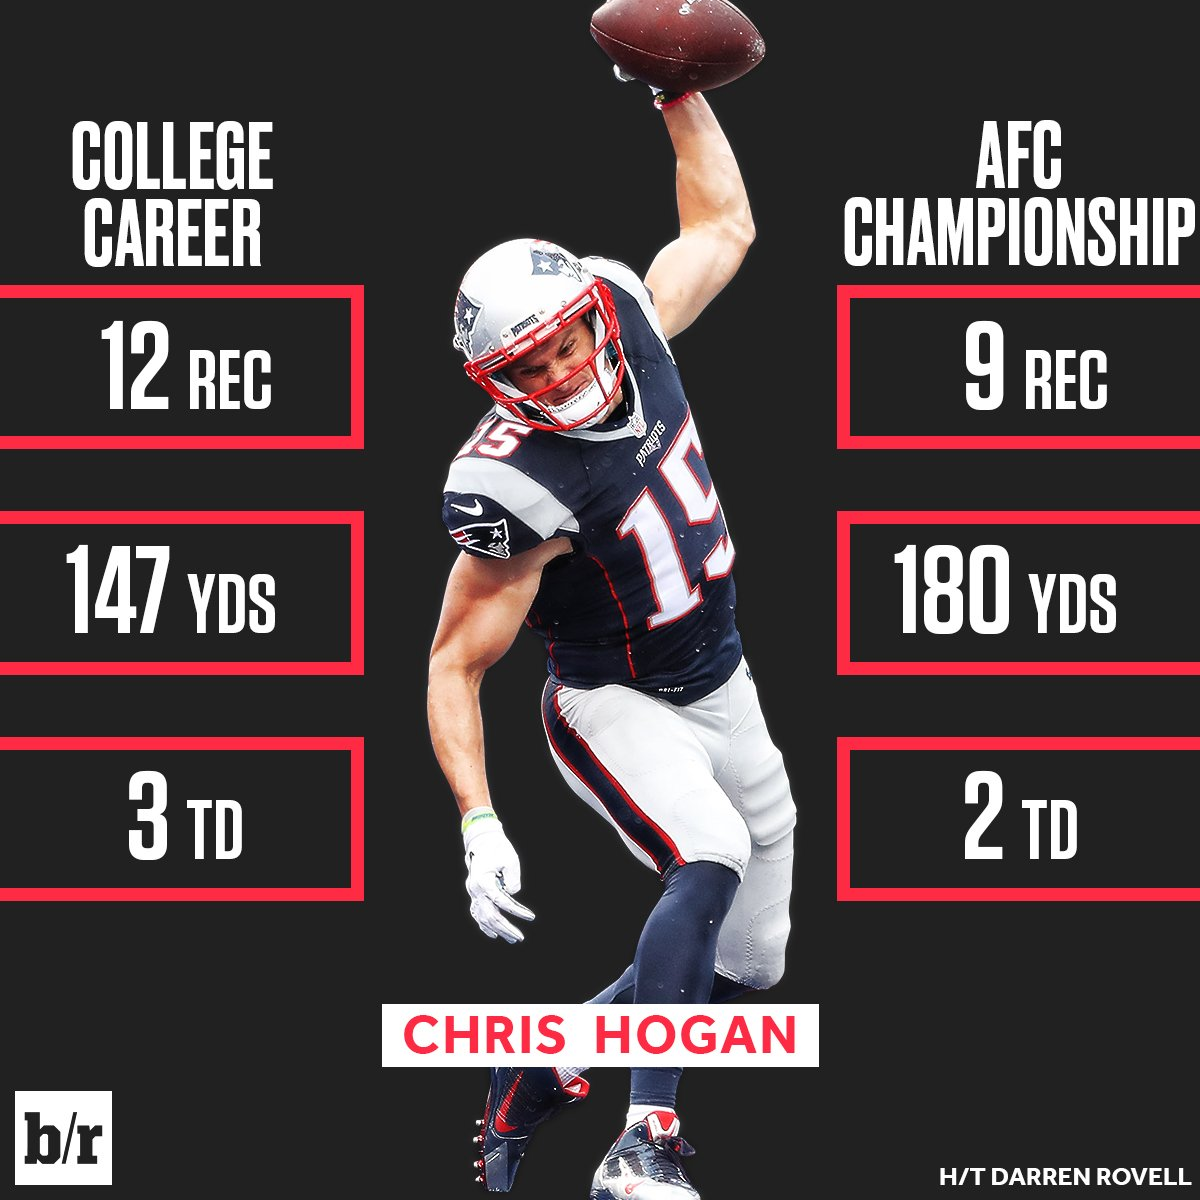 Chris Hogan seized the moment.